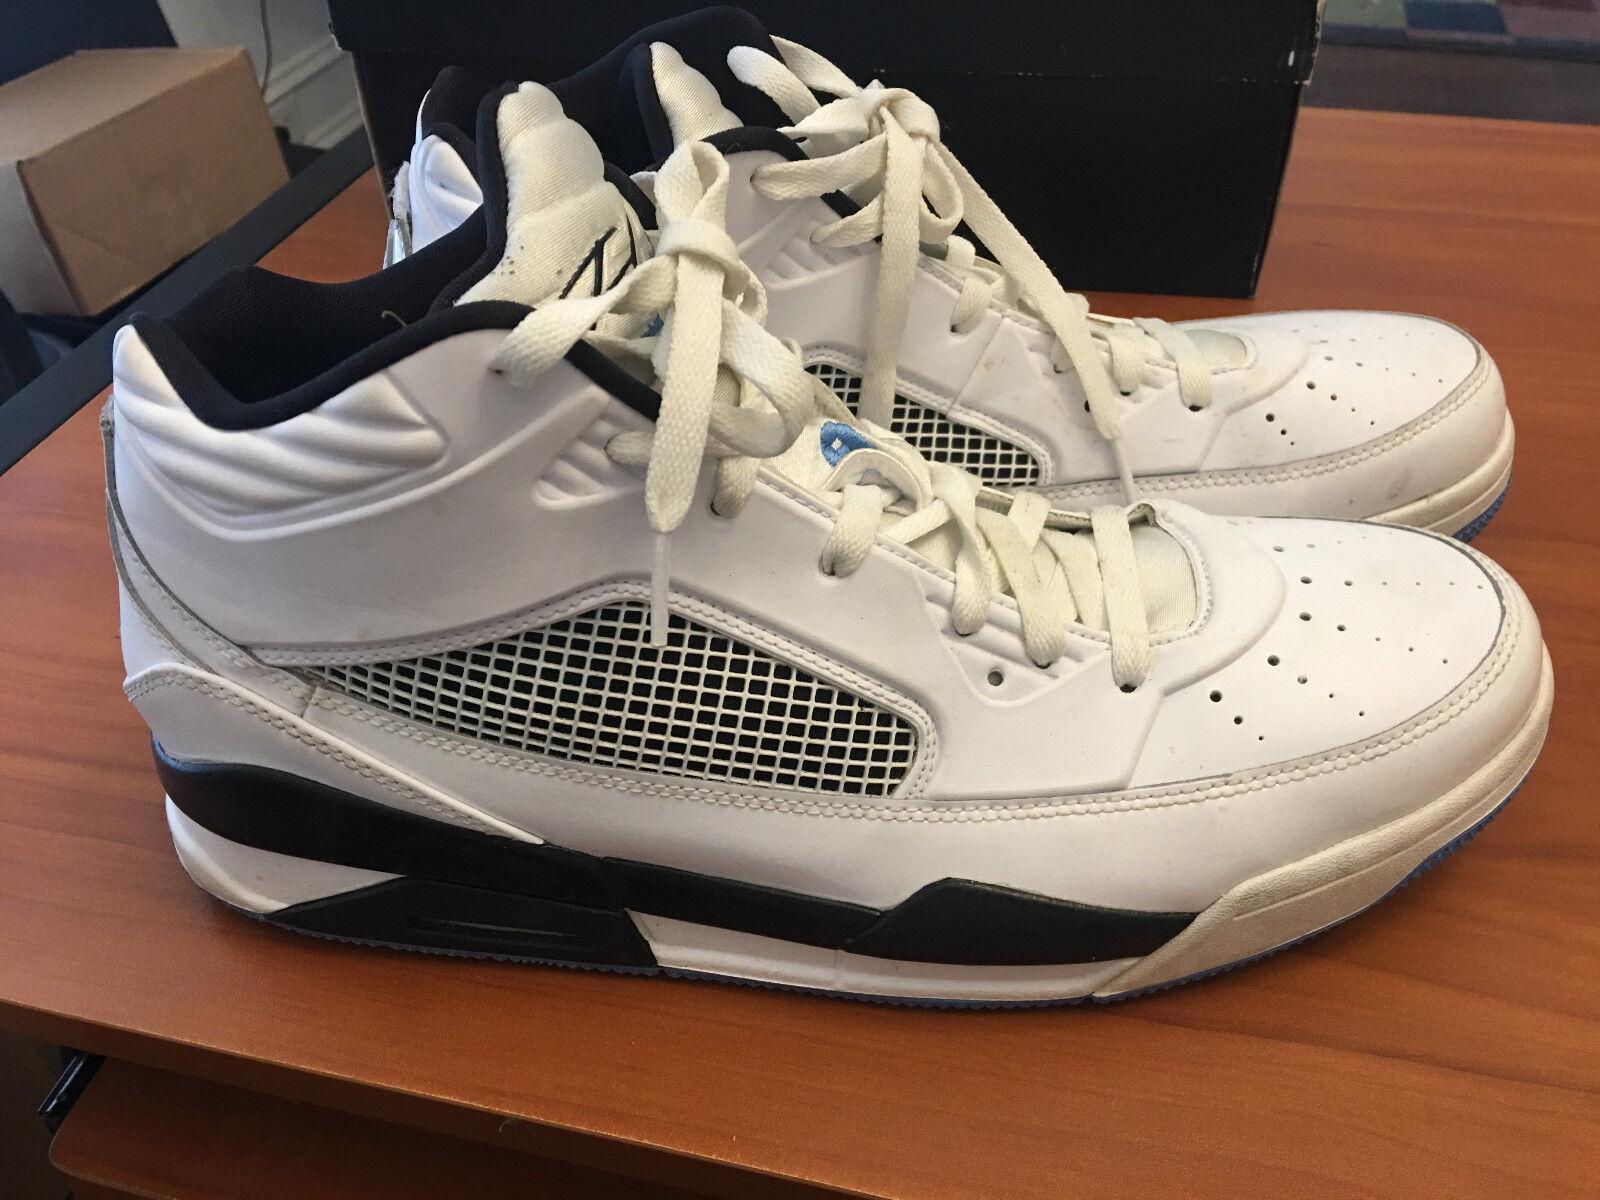 c791edba697 Nike Air Jordan Flight White Black Baby Blue Mens Size 13 US 654262 ...